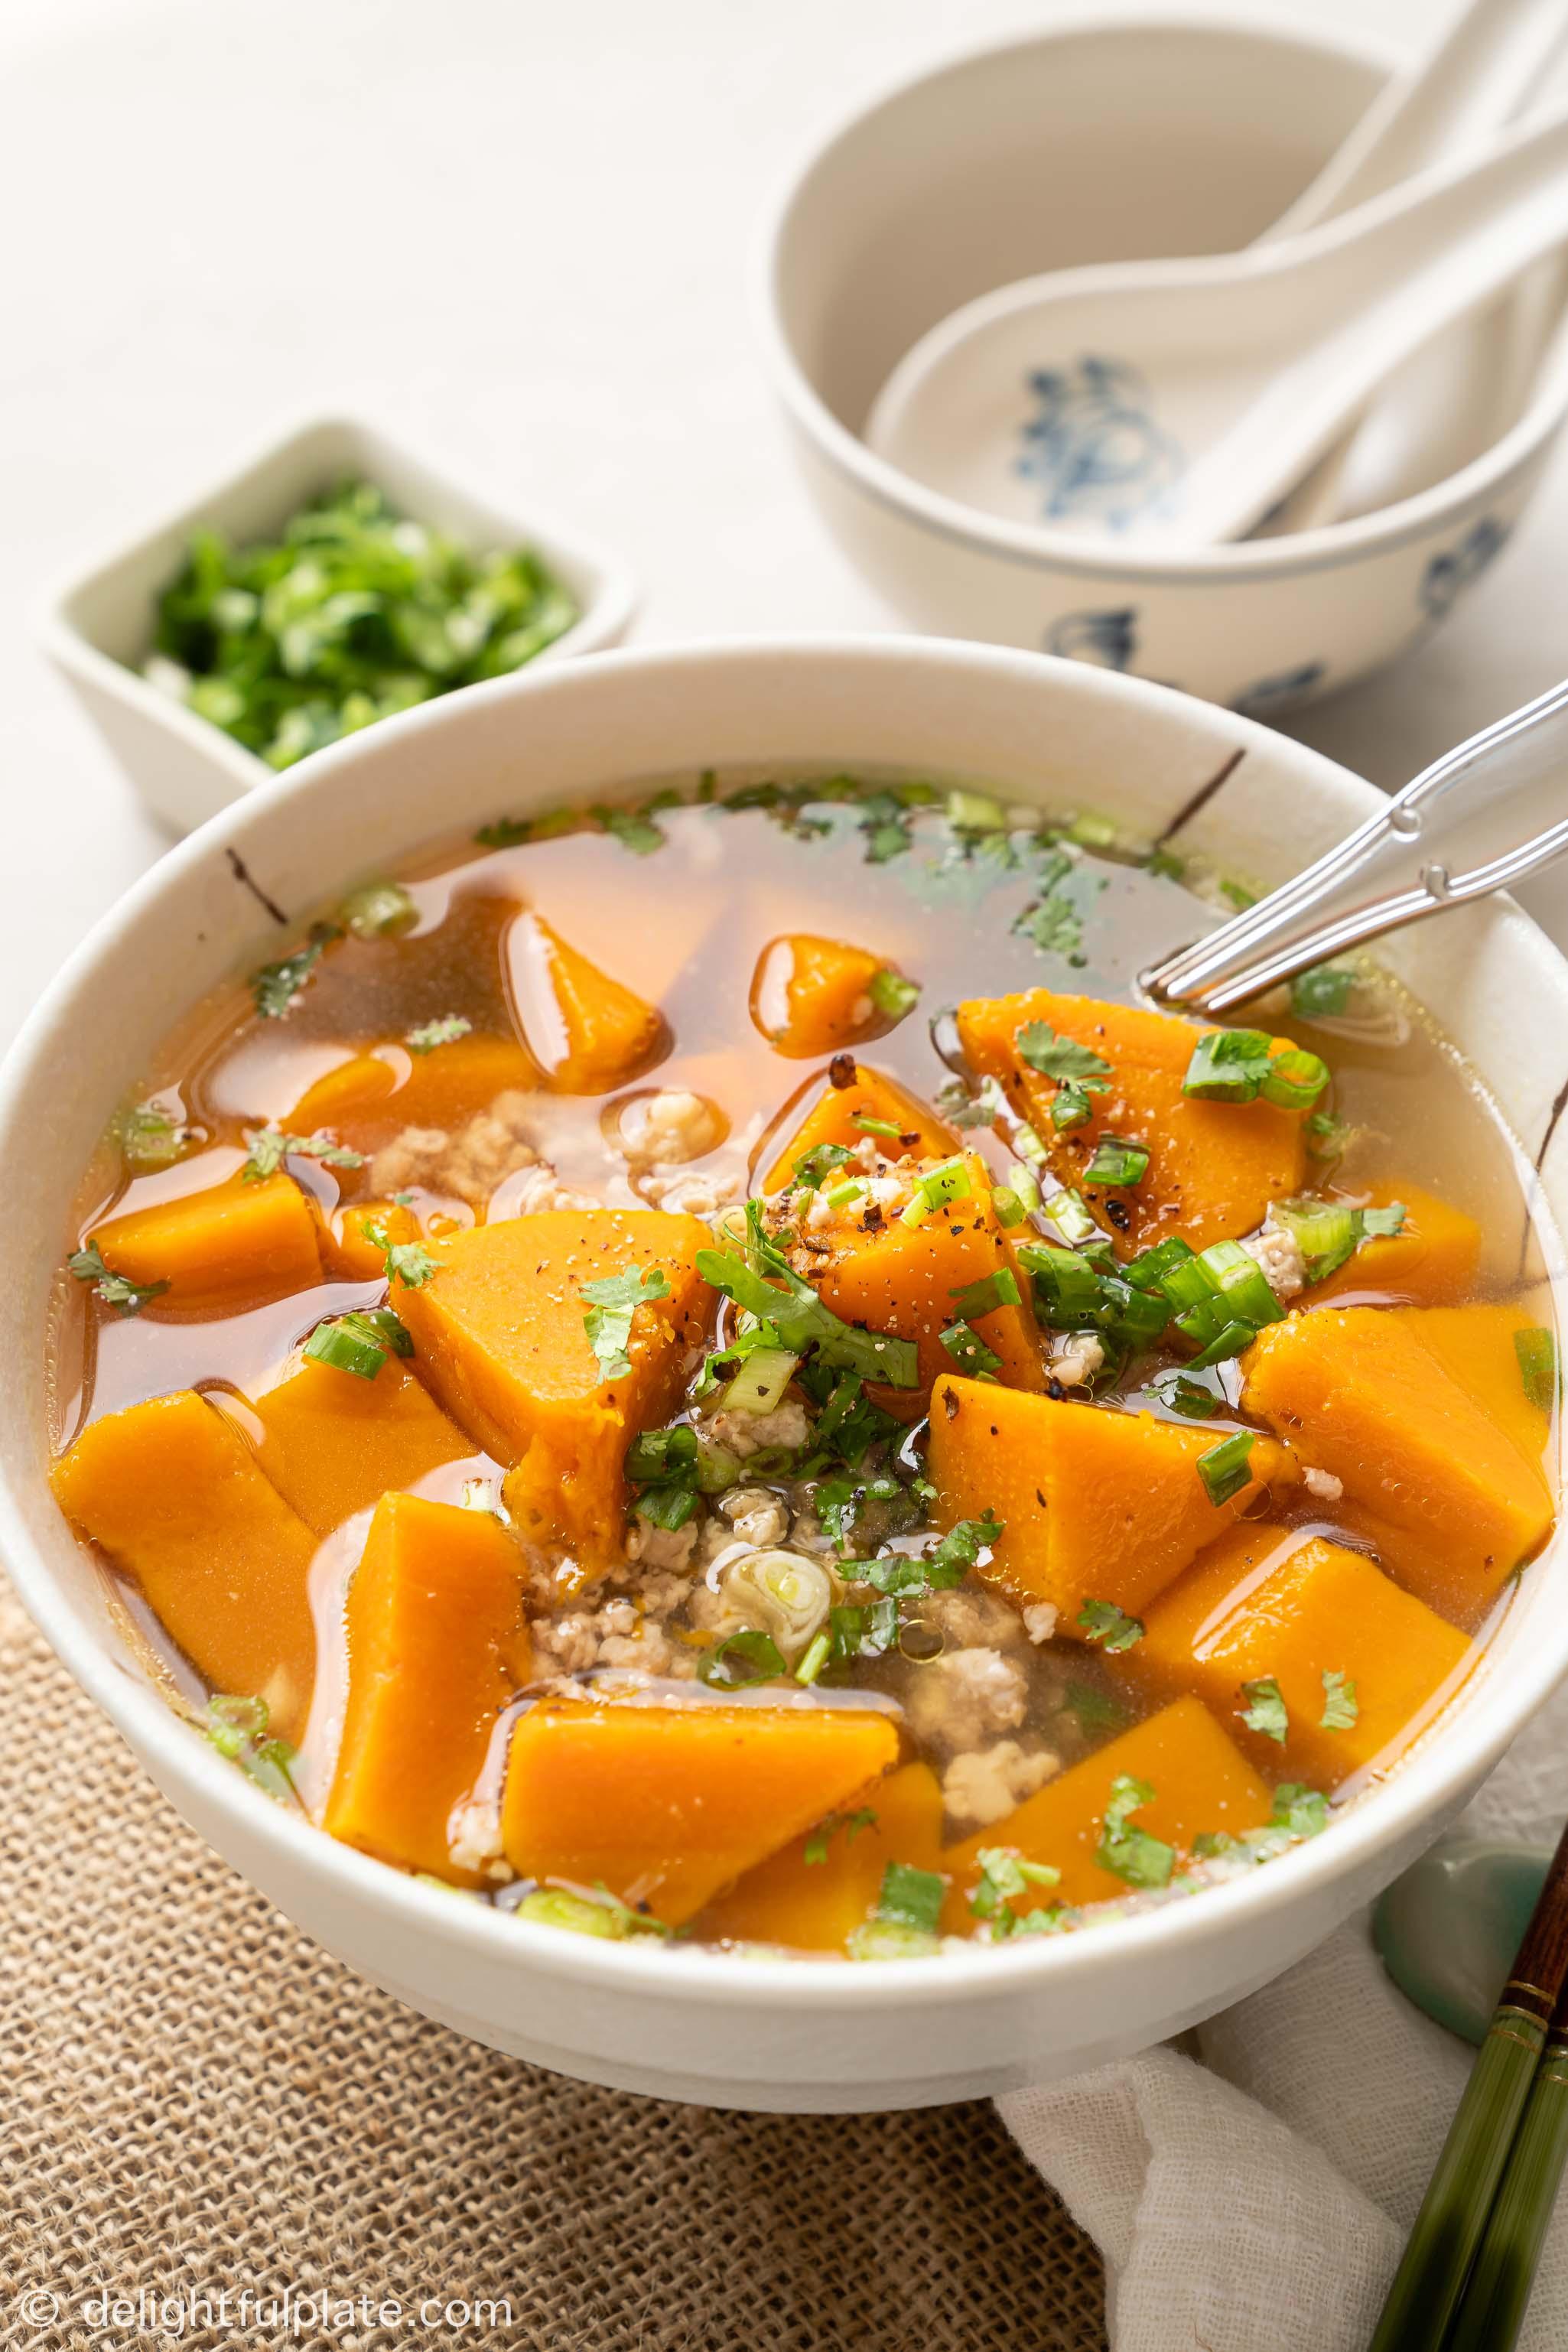 a bowl of Vietnamese butternut squash soup (canh bi do)